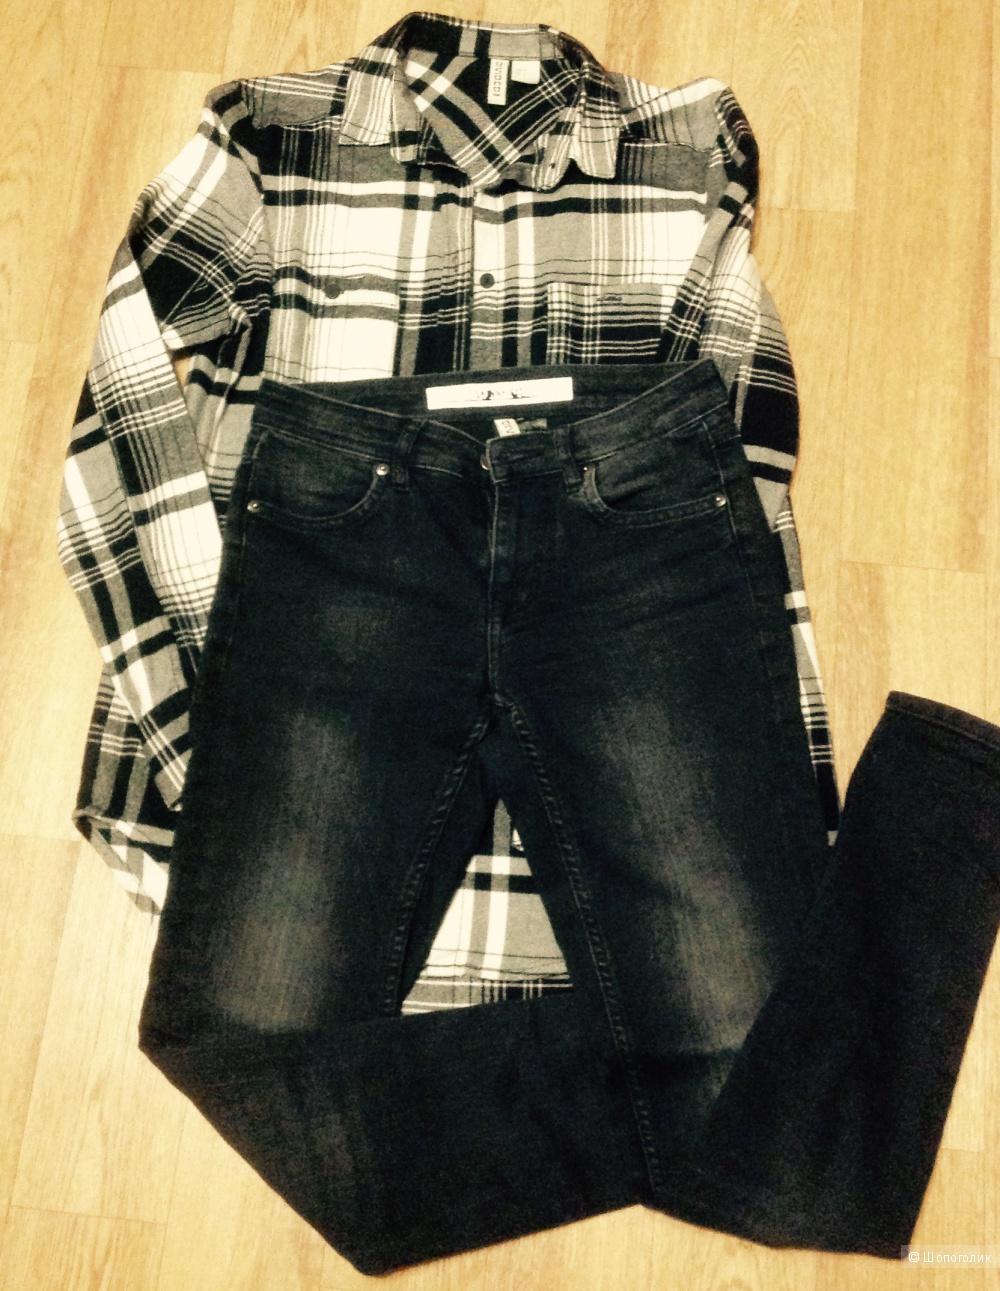 Комплект, джинсы(скинни)+рубашка, H&M, разм. XS